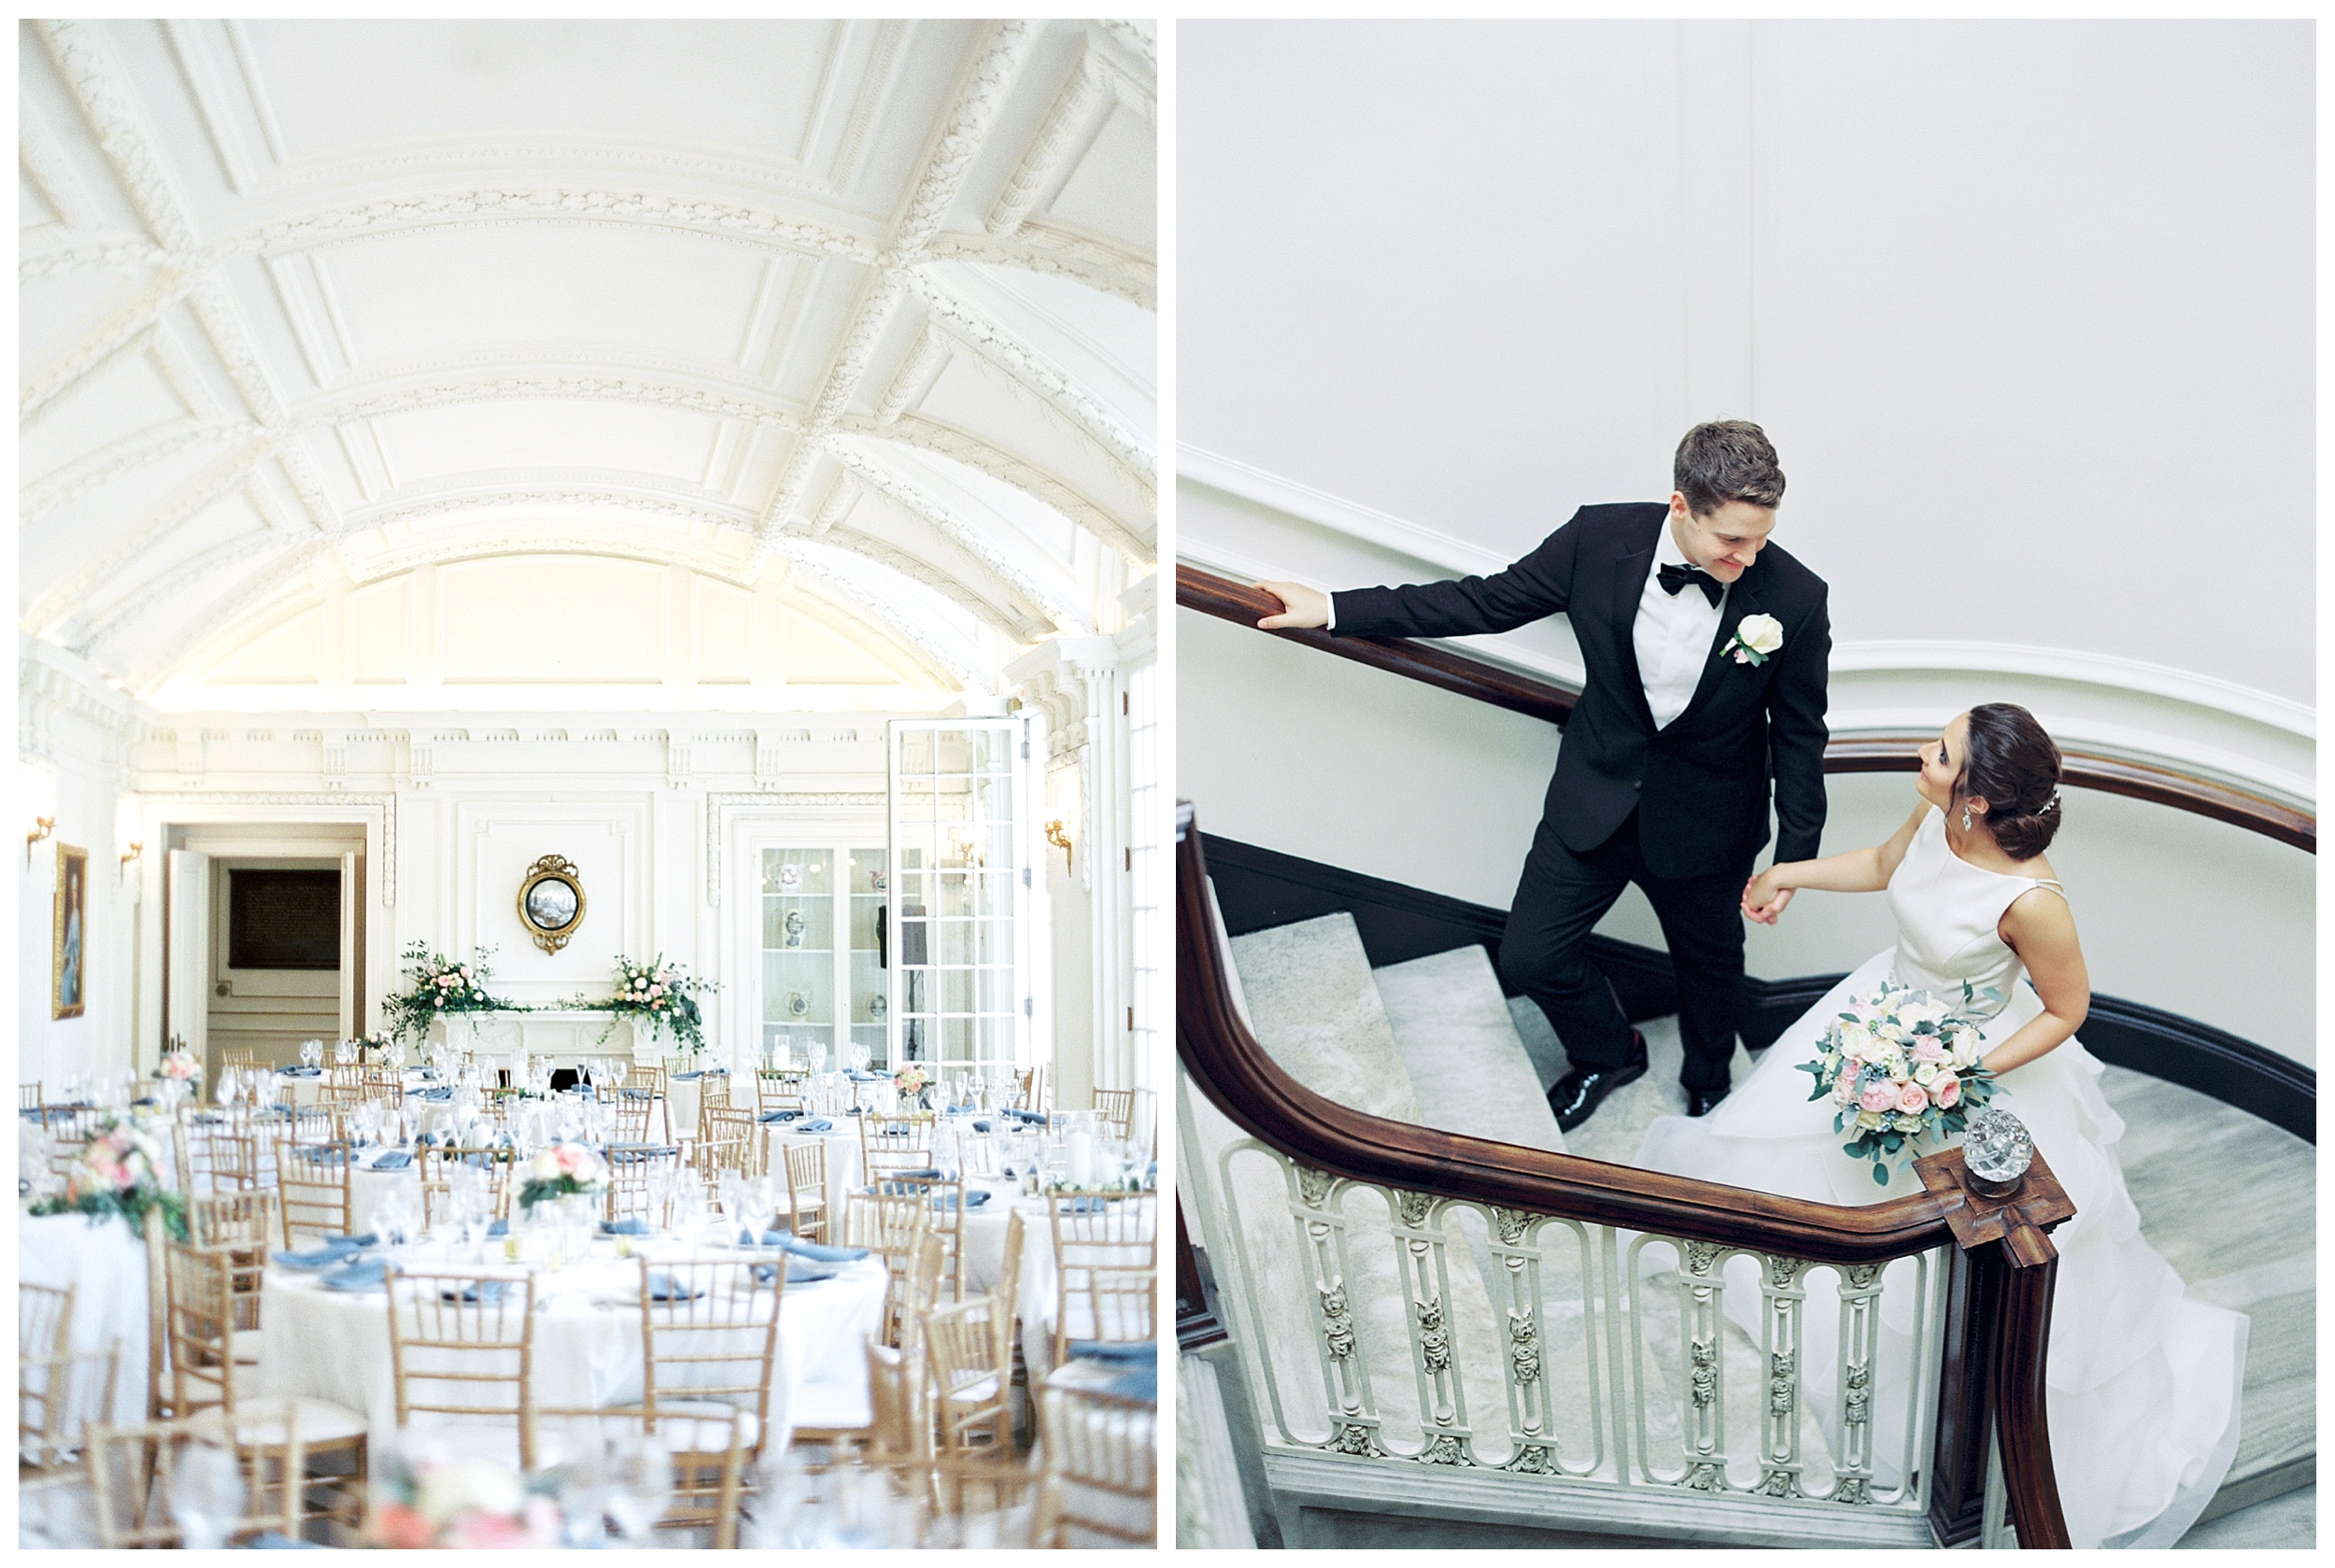 DAR Constitution Hall Wedding Wedding | Daughters of the American Revolution Wedding | District of Columbia Film Wedding Photographer Kir Tuben_0121.jpg